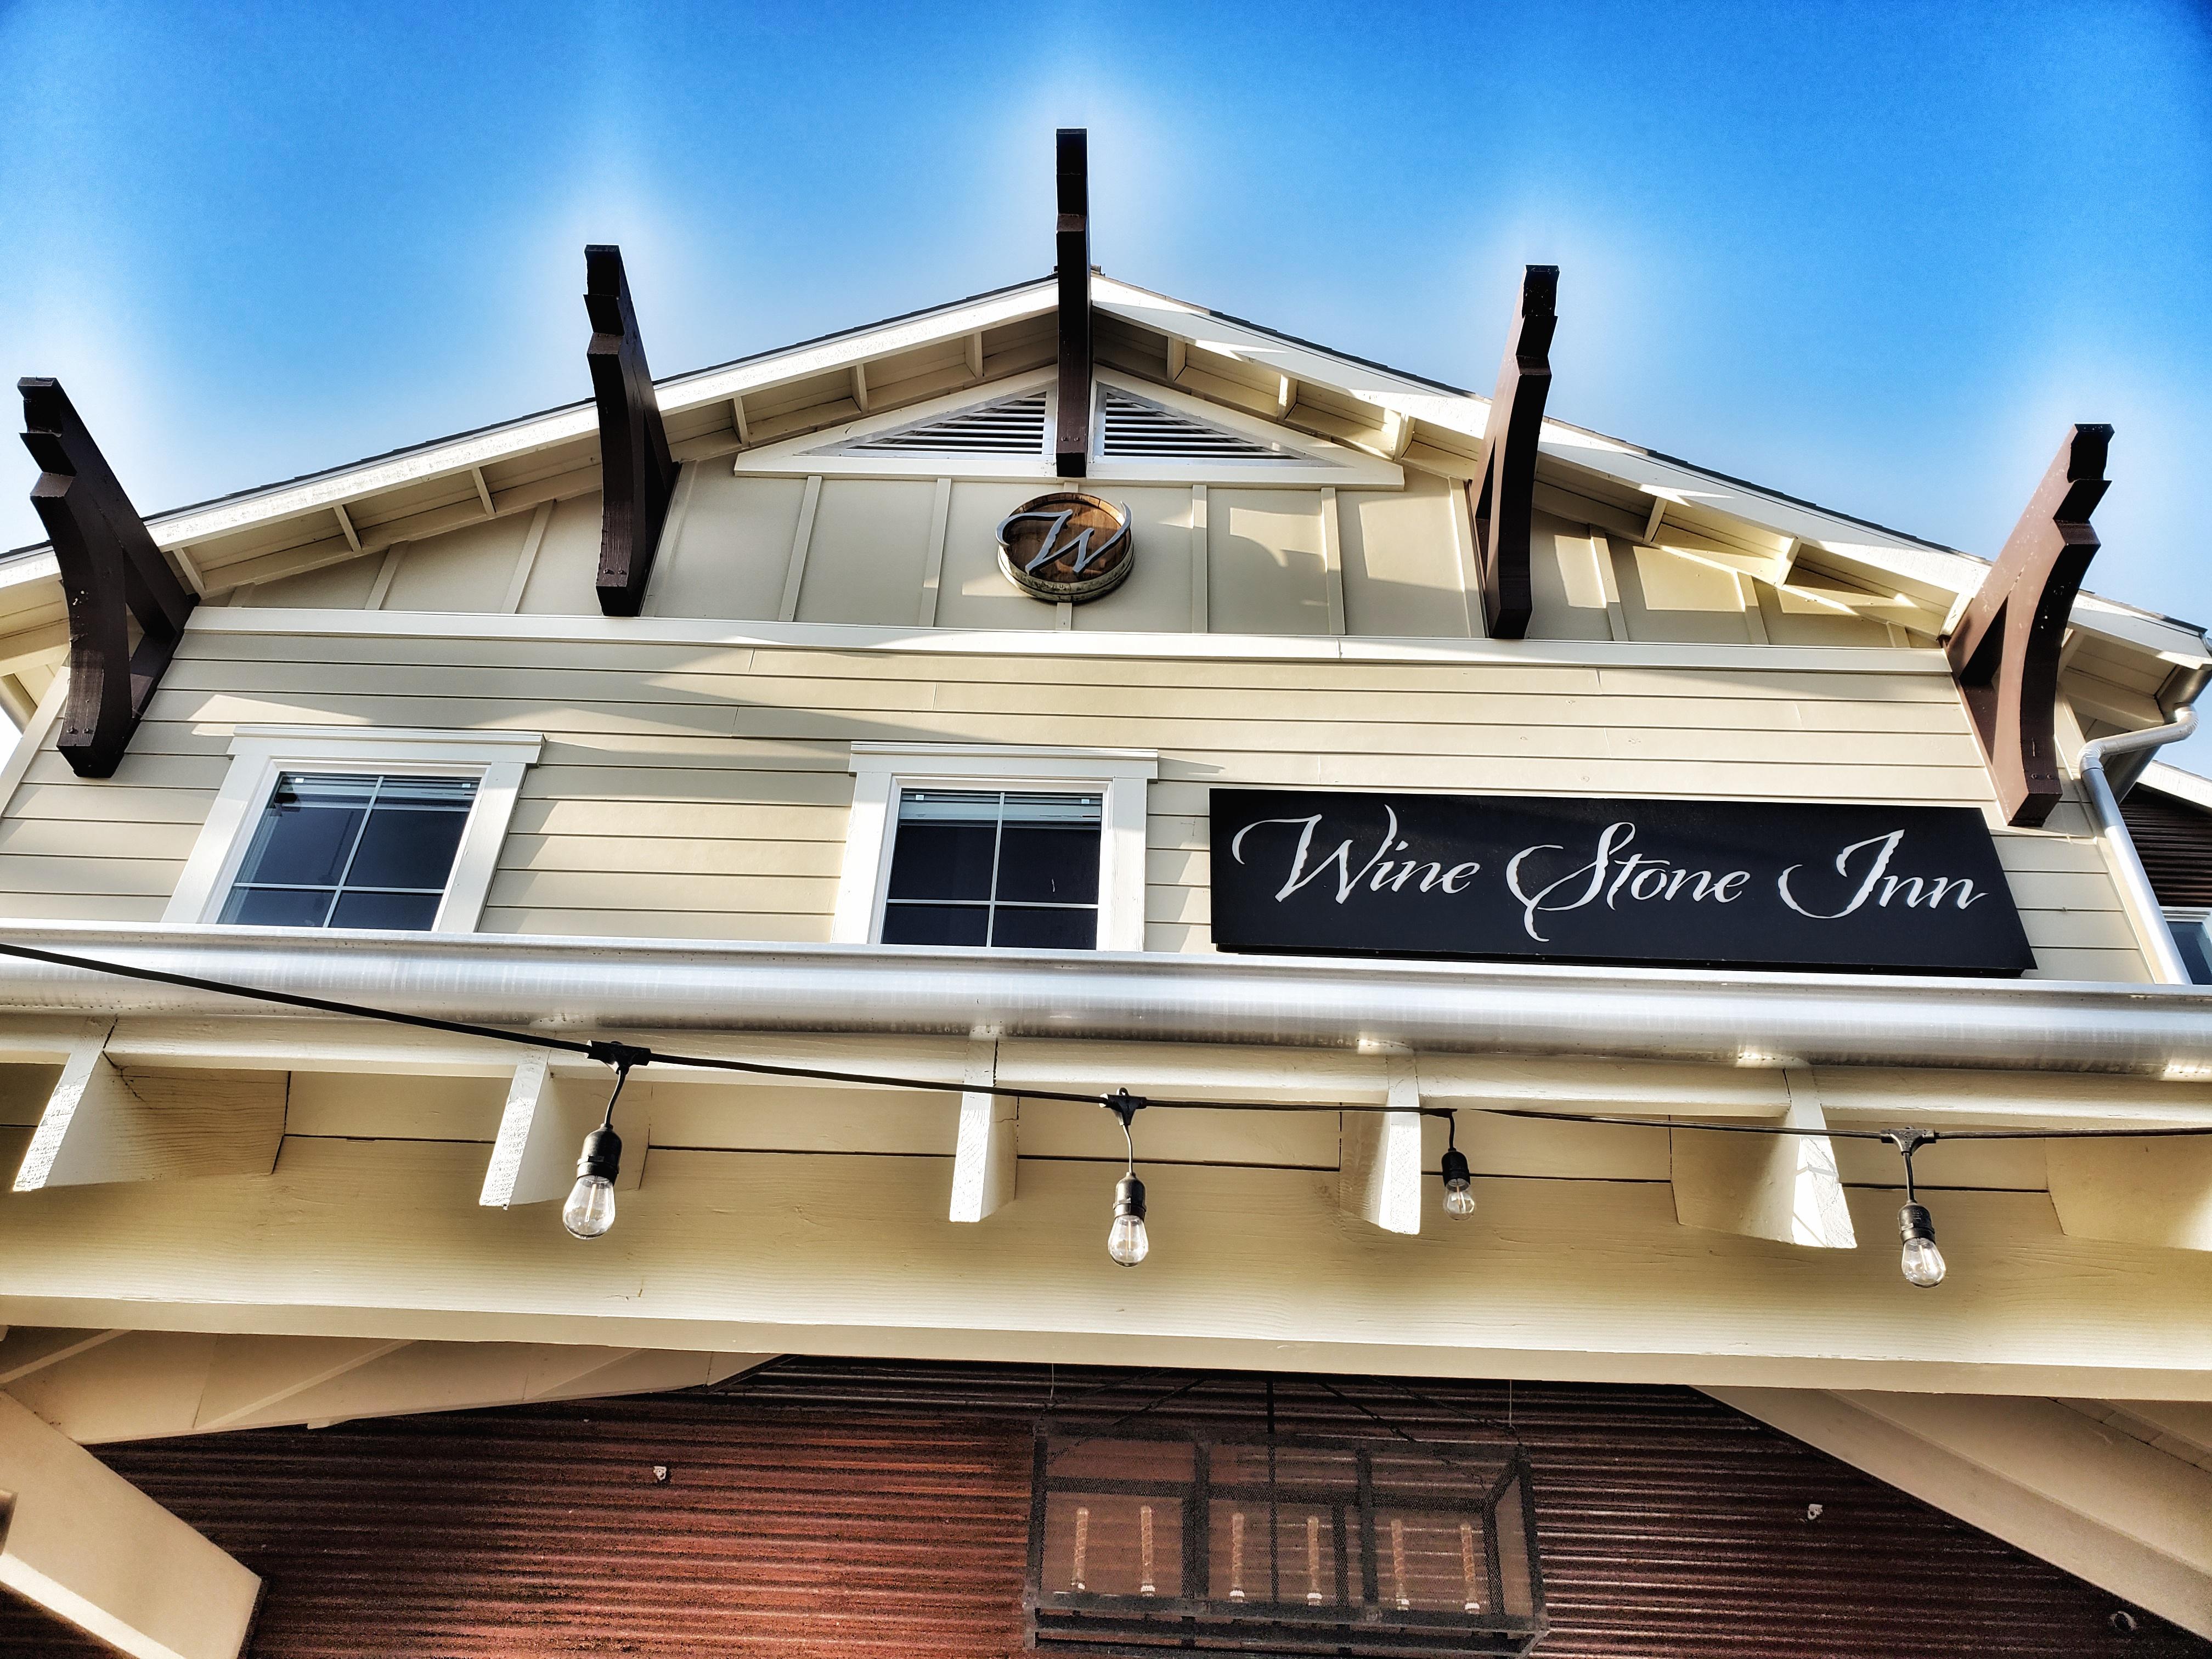 Wine Stone Inn exterior